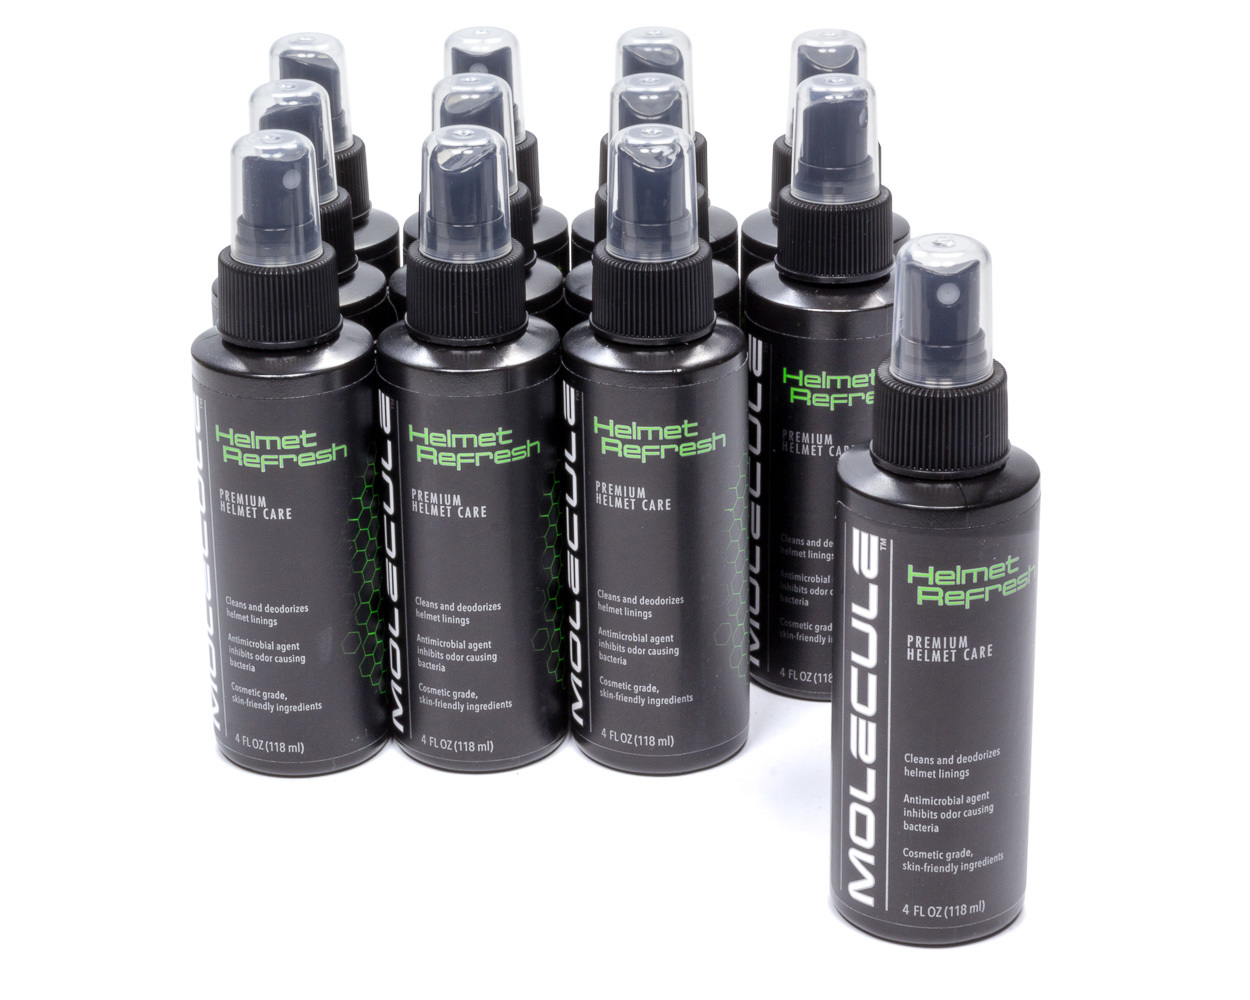 Helmet Fabric Refresher 4oz Spray Case of 12